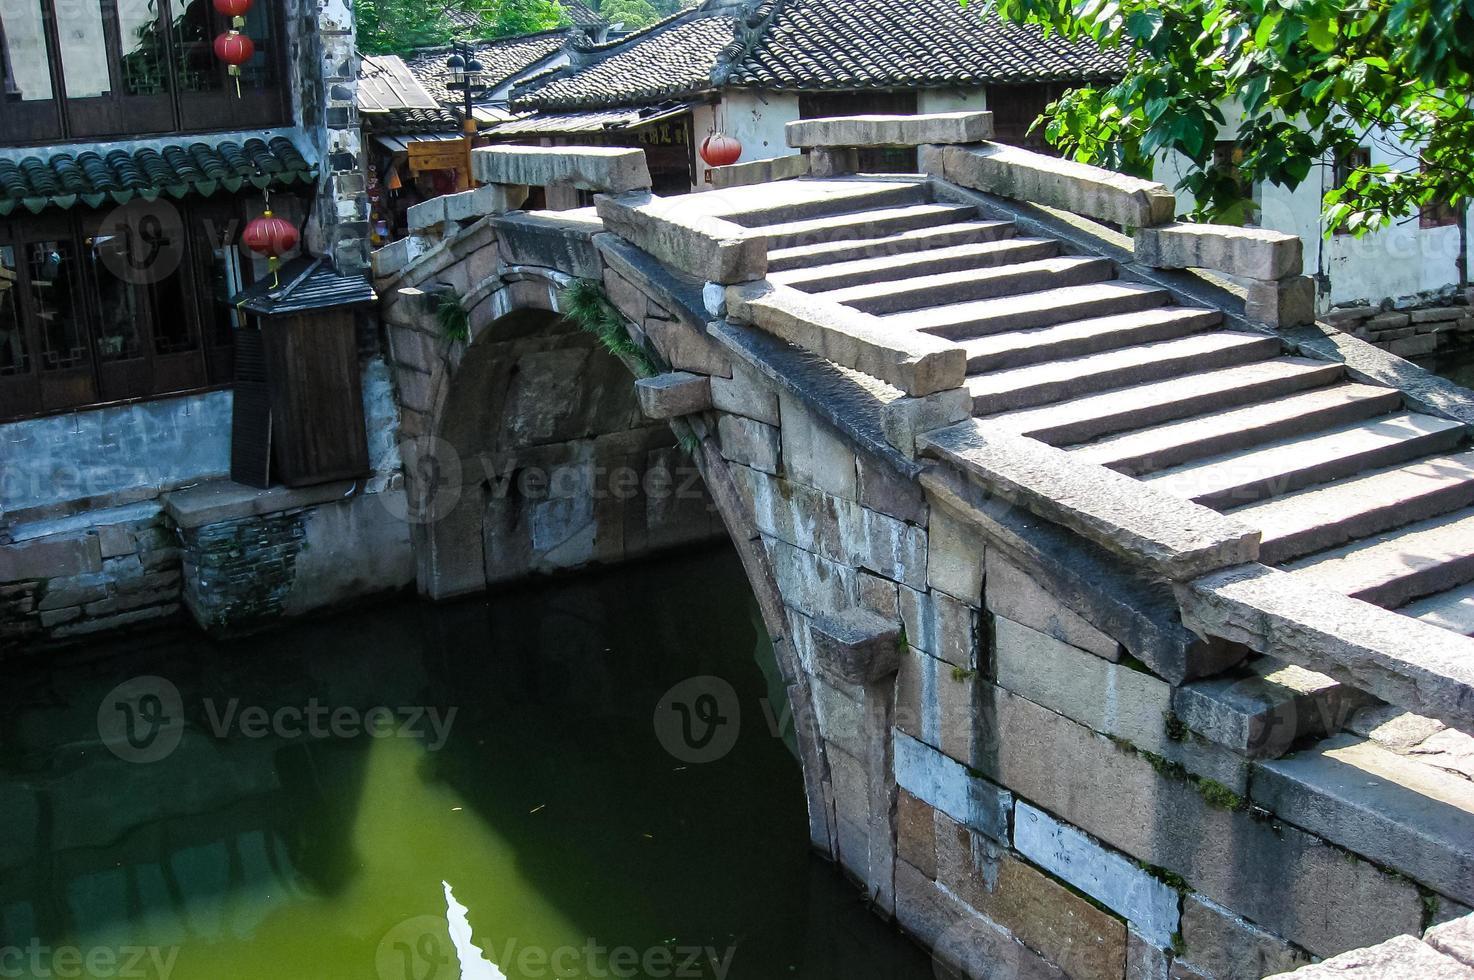 scènes uit suzhou, ook wel chinees venetië genoemd foto